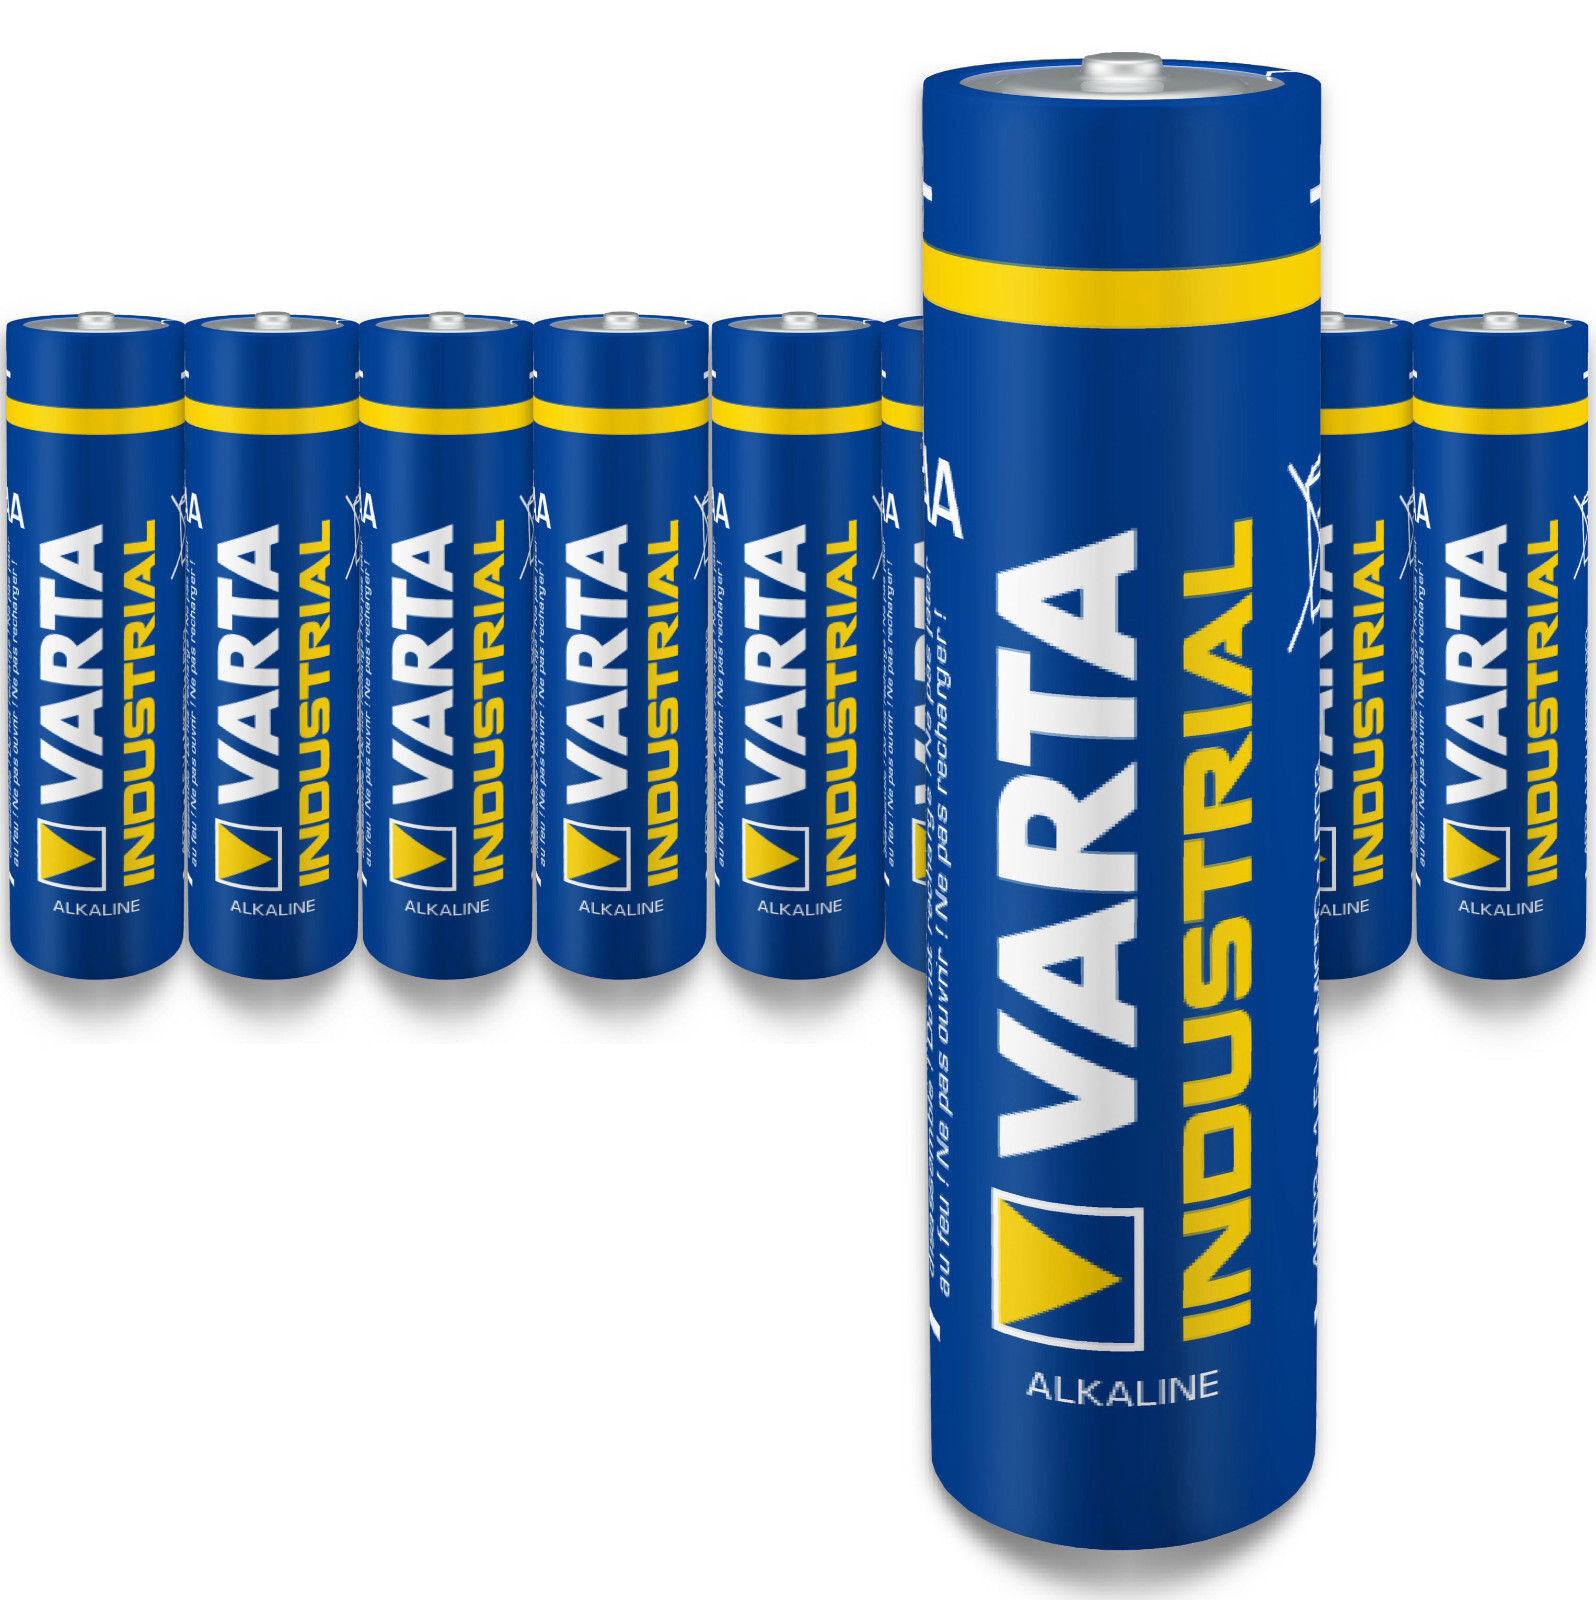 Varta AAA Micro Batterie LR03 1,5V MN2400 Alkaline Industrial Industrial Industrial | Schön geformt  7818af